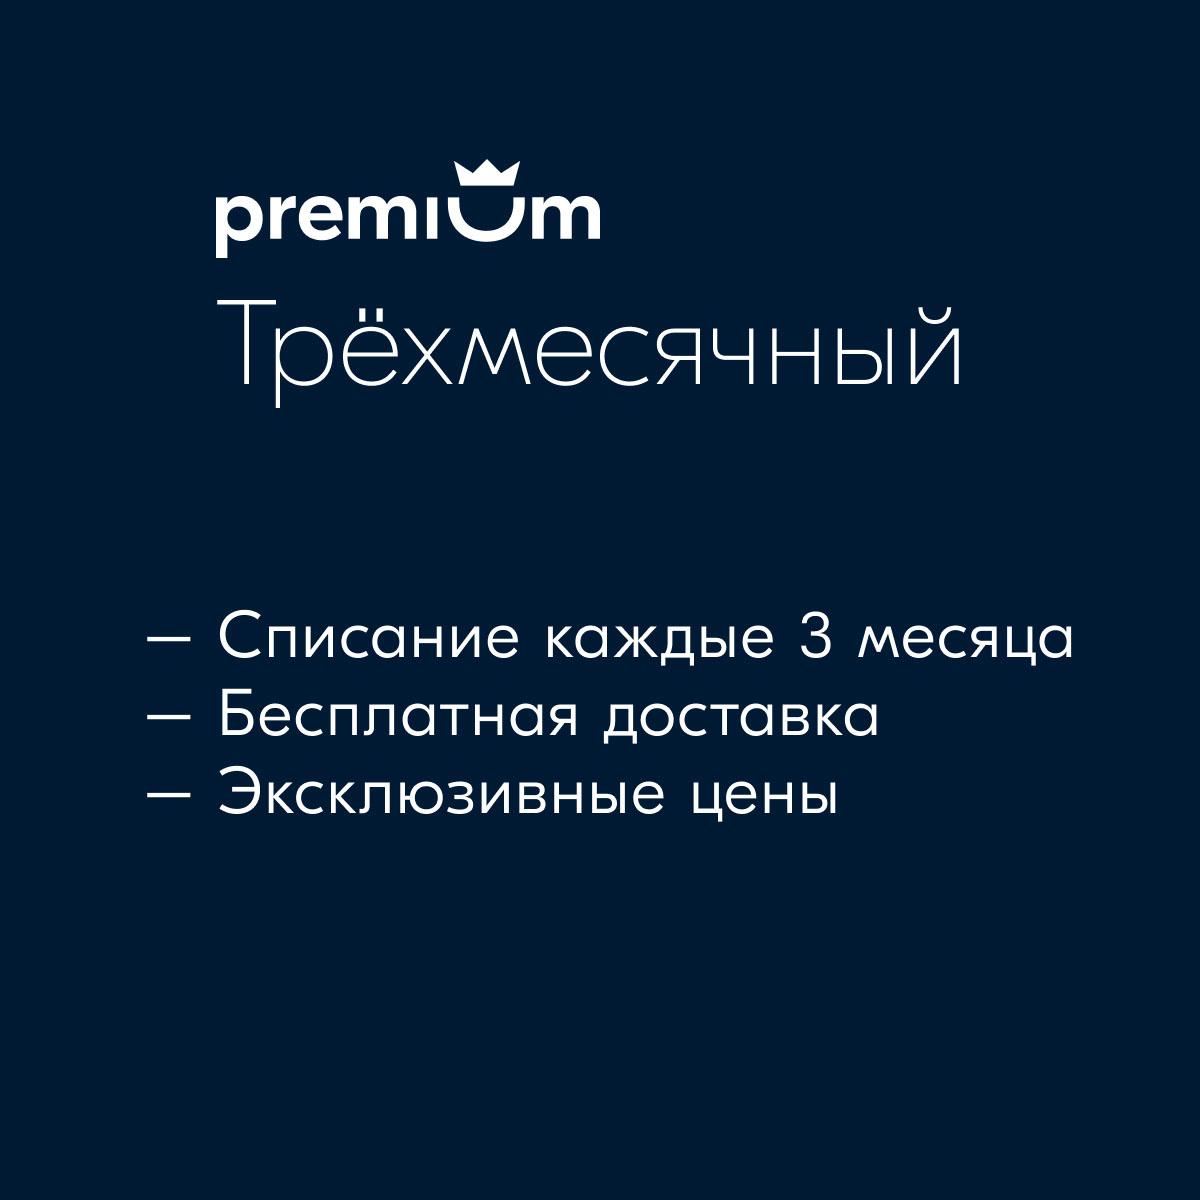 Подписка Ozon Premium, трехмесячная #1